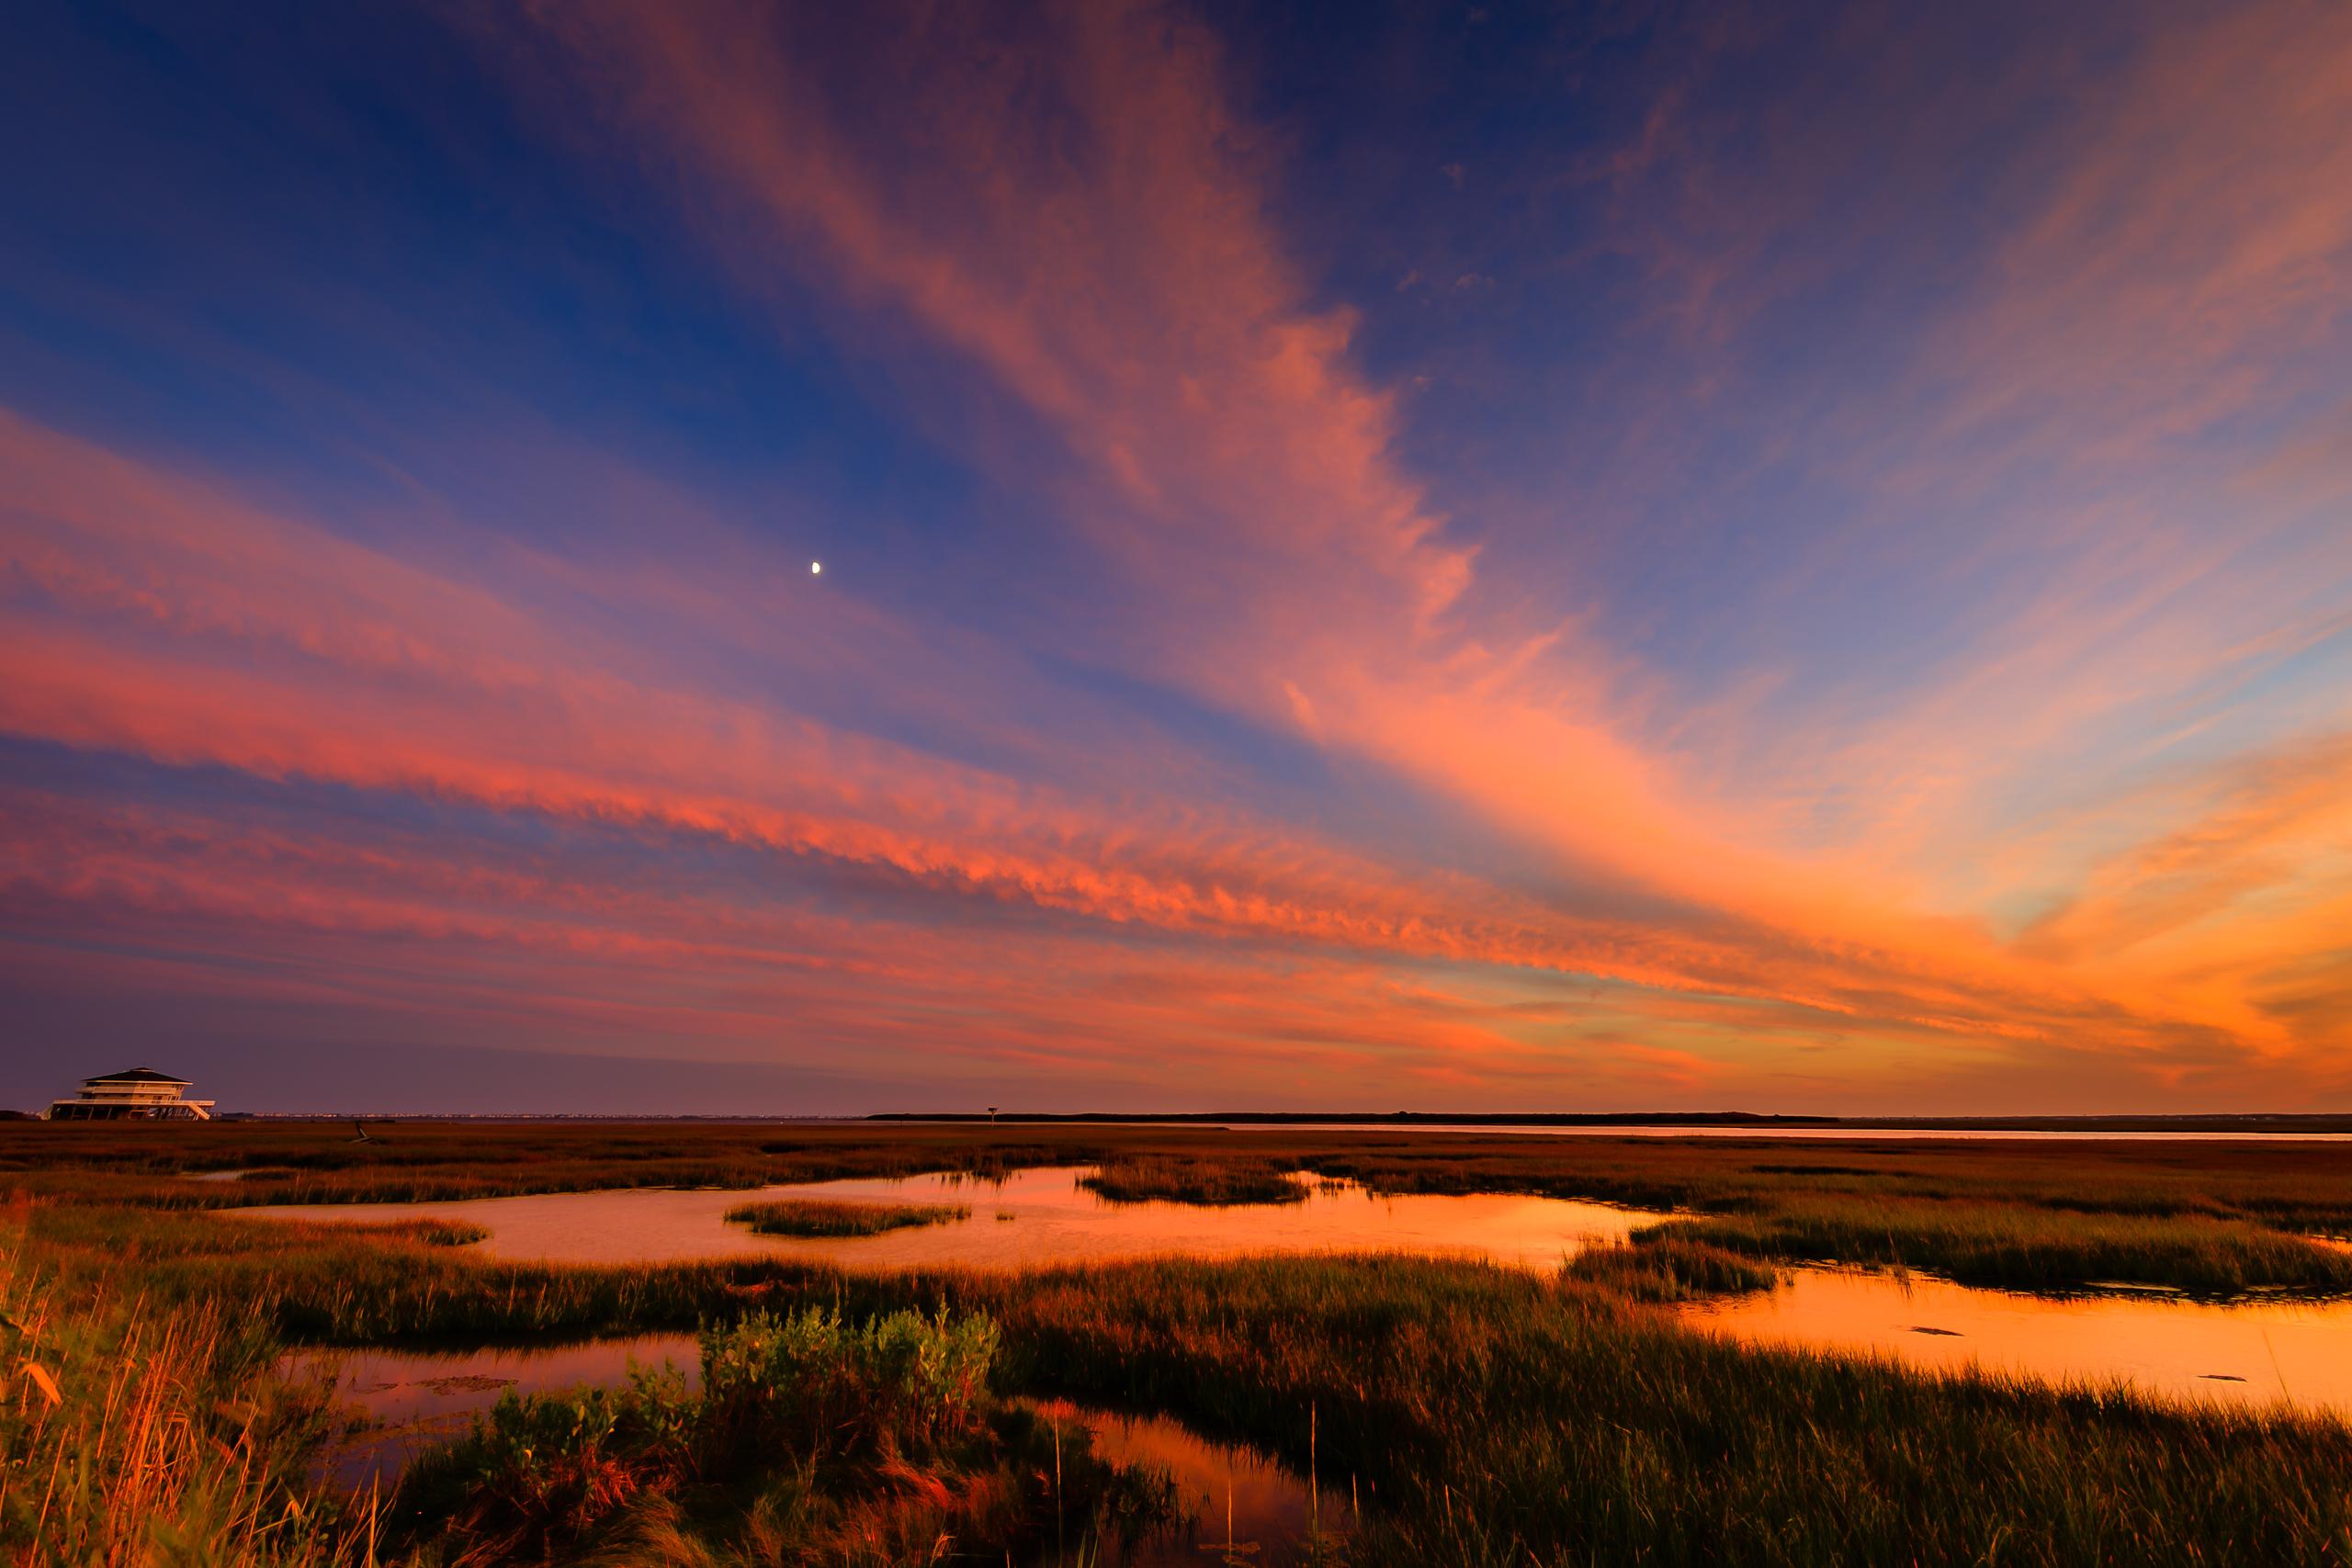 Santa Barbara Sunset - HDR | Amery | Flickr